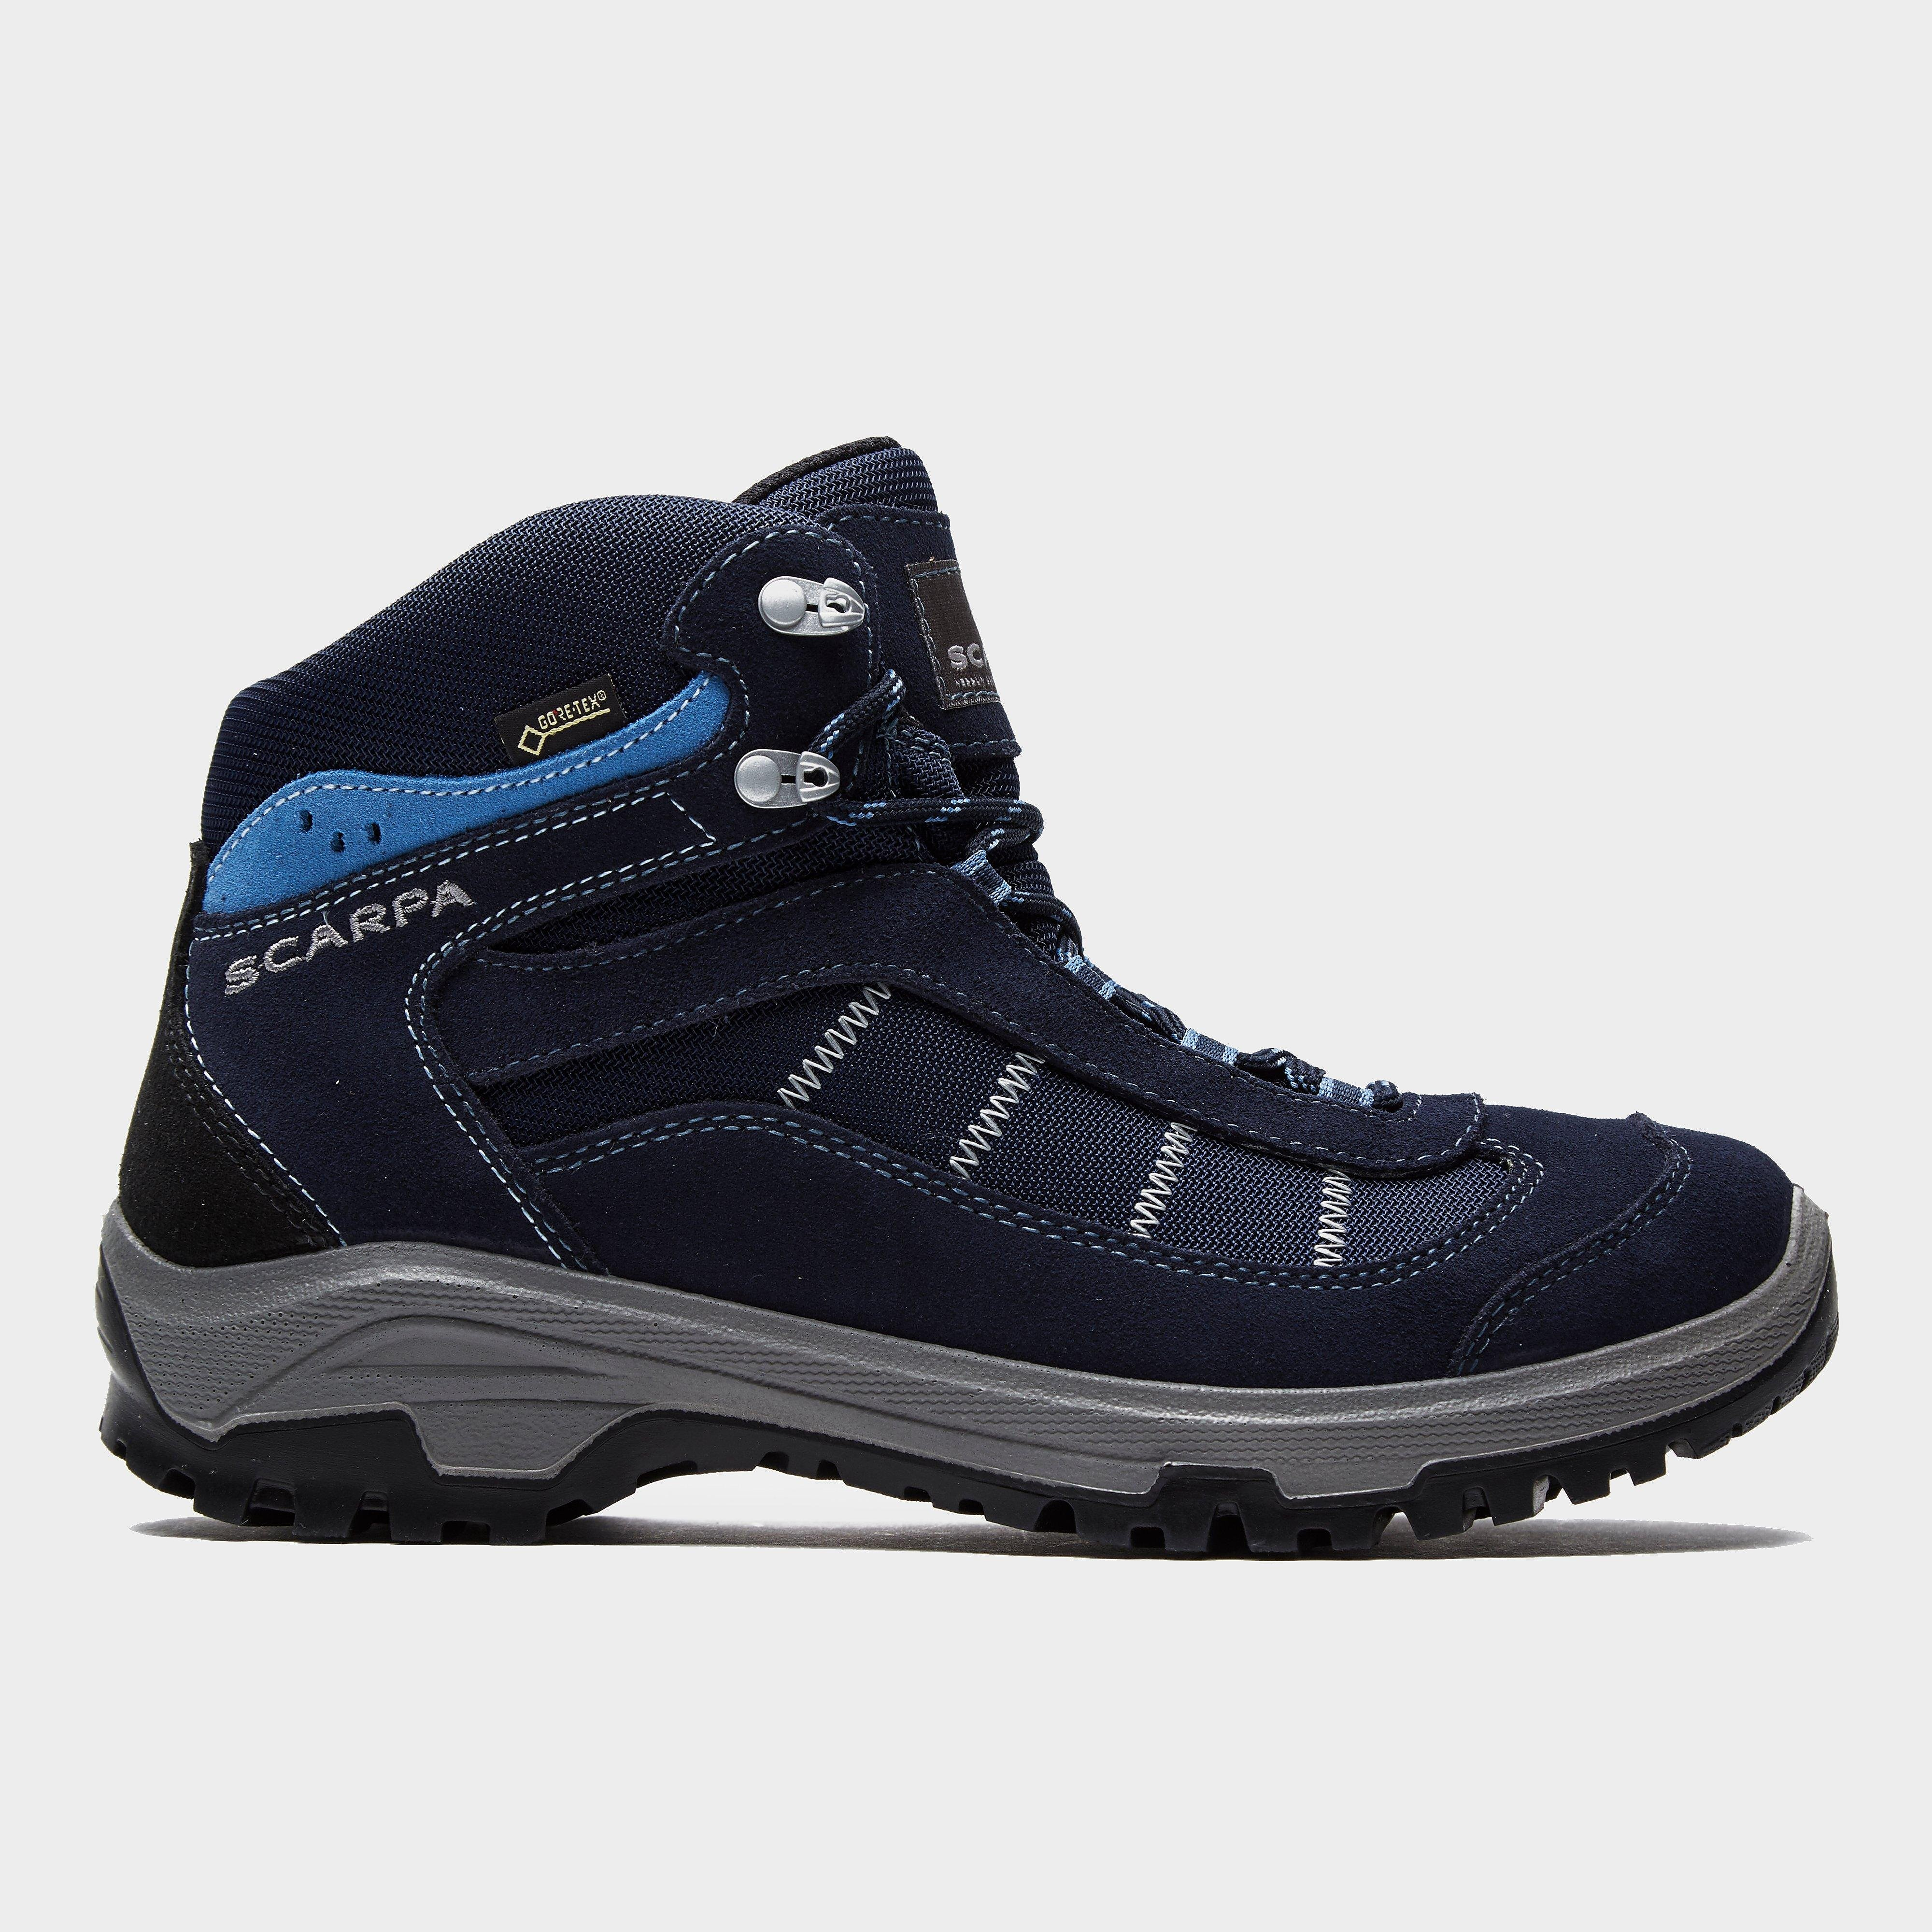 Scarpa Bora Gore-Tex Women's Walking Boots